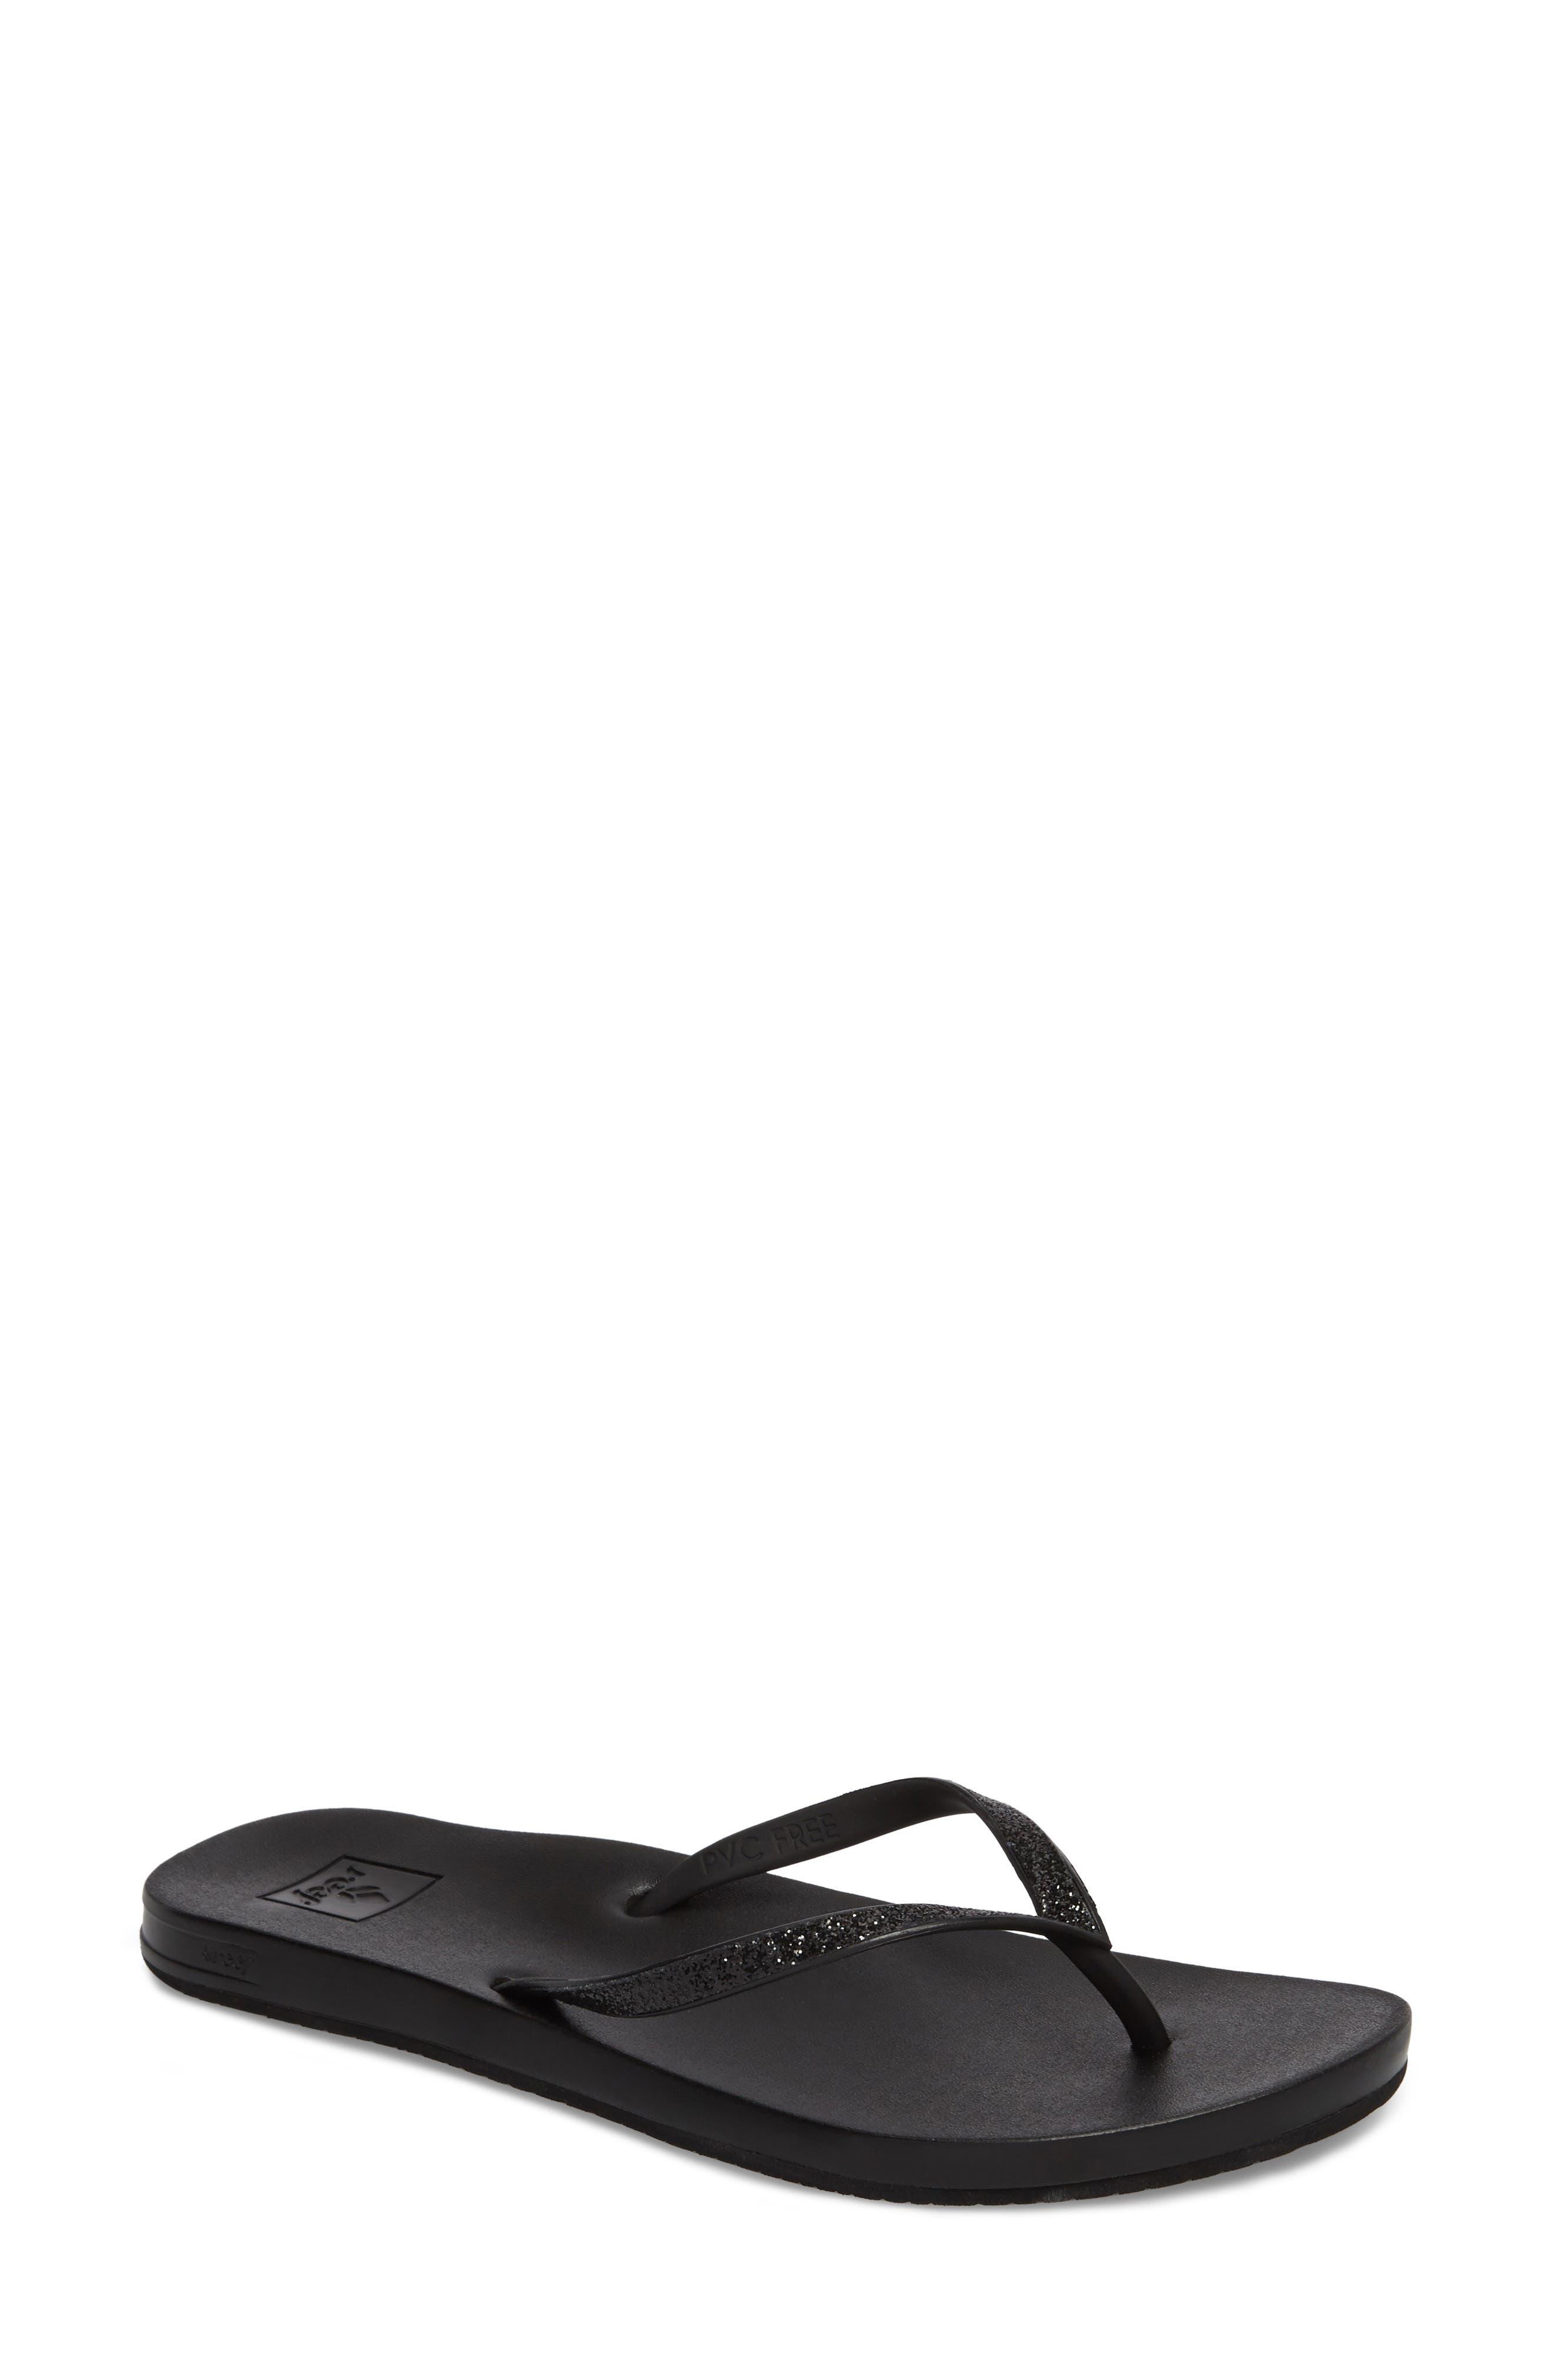 REEF Cushion Bounce Stargazer Flip Flop, Main, color, BLACK